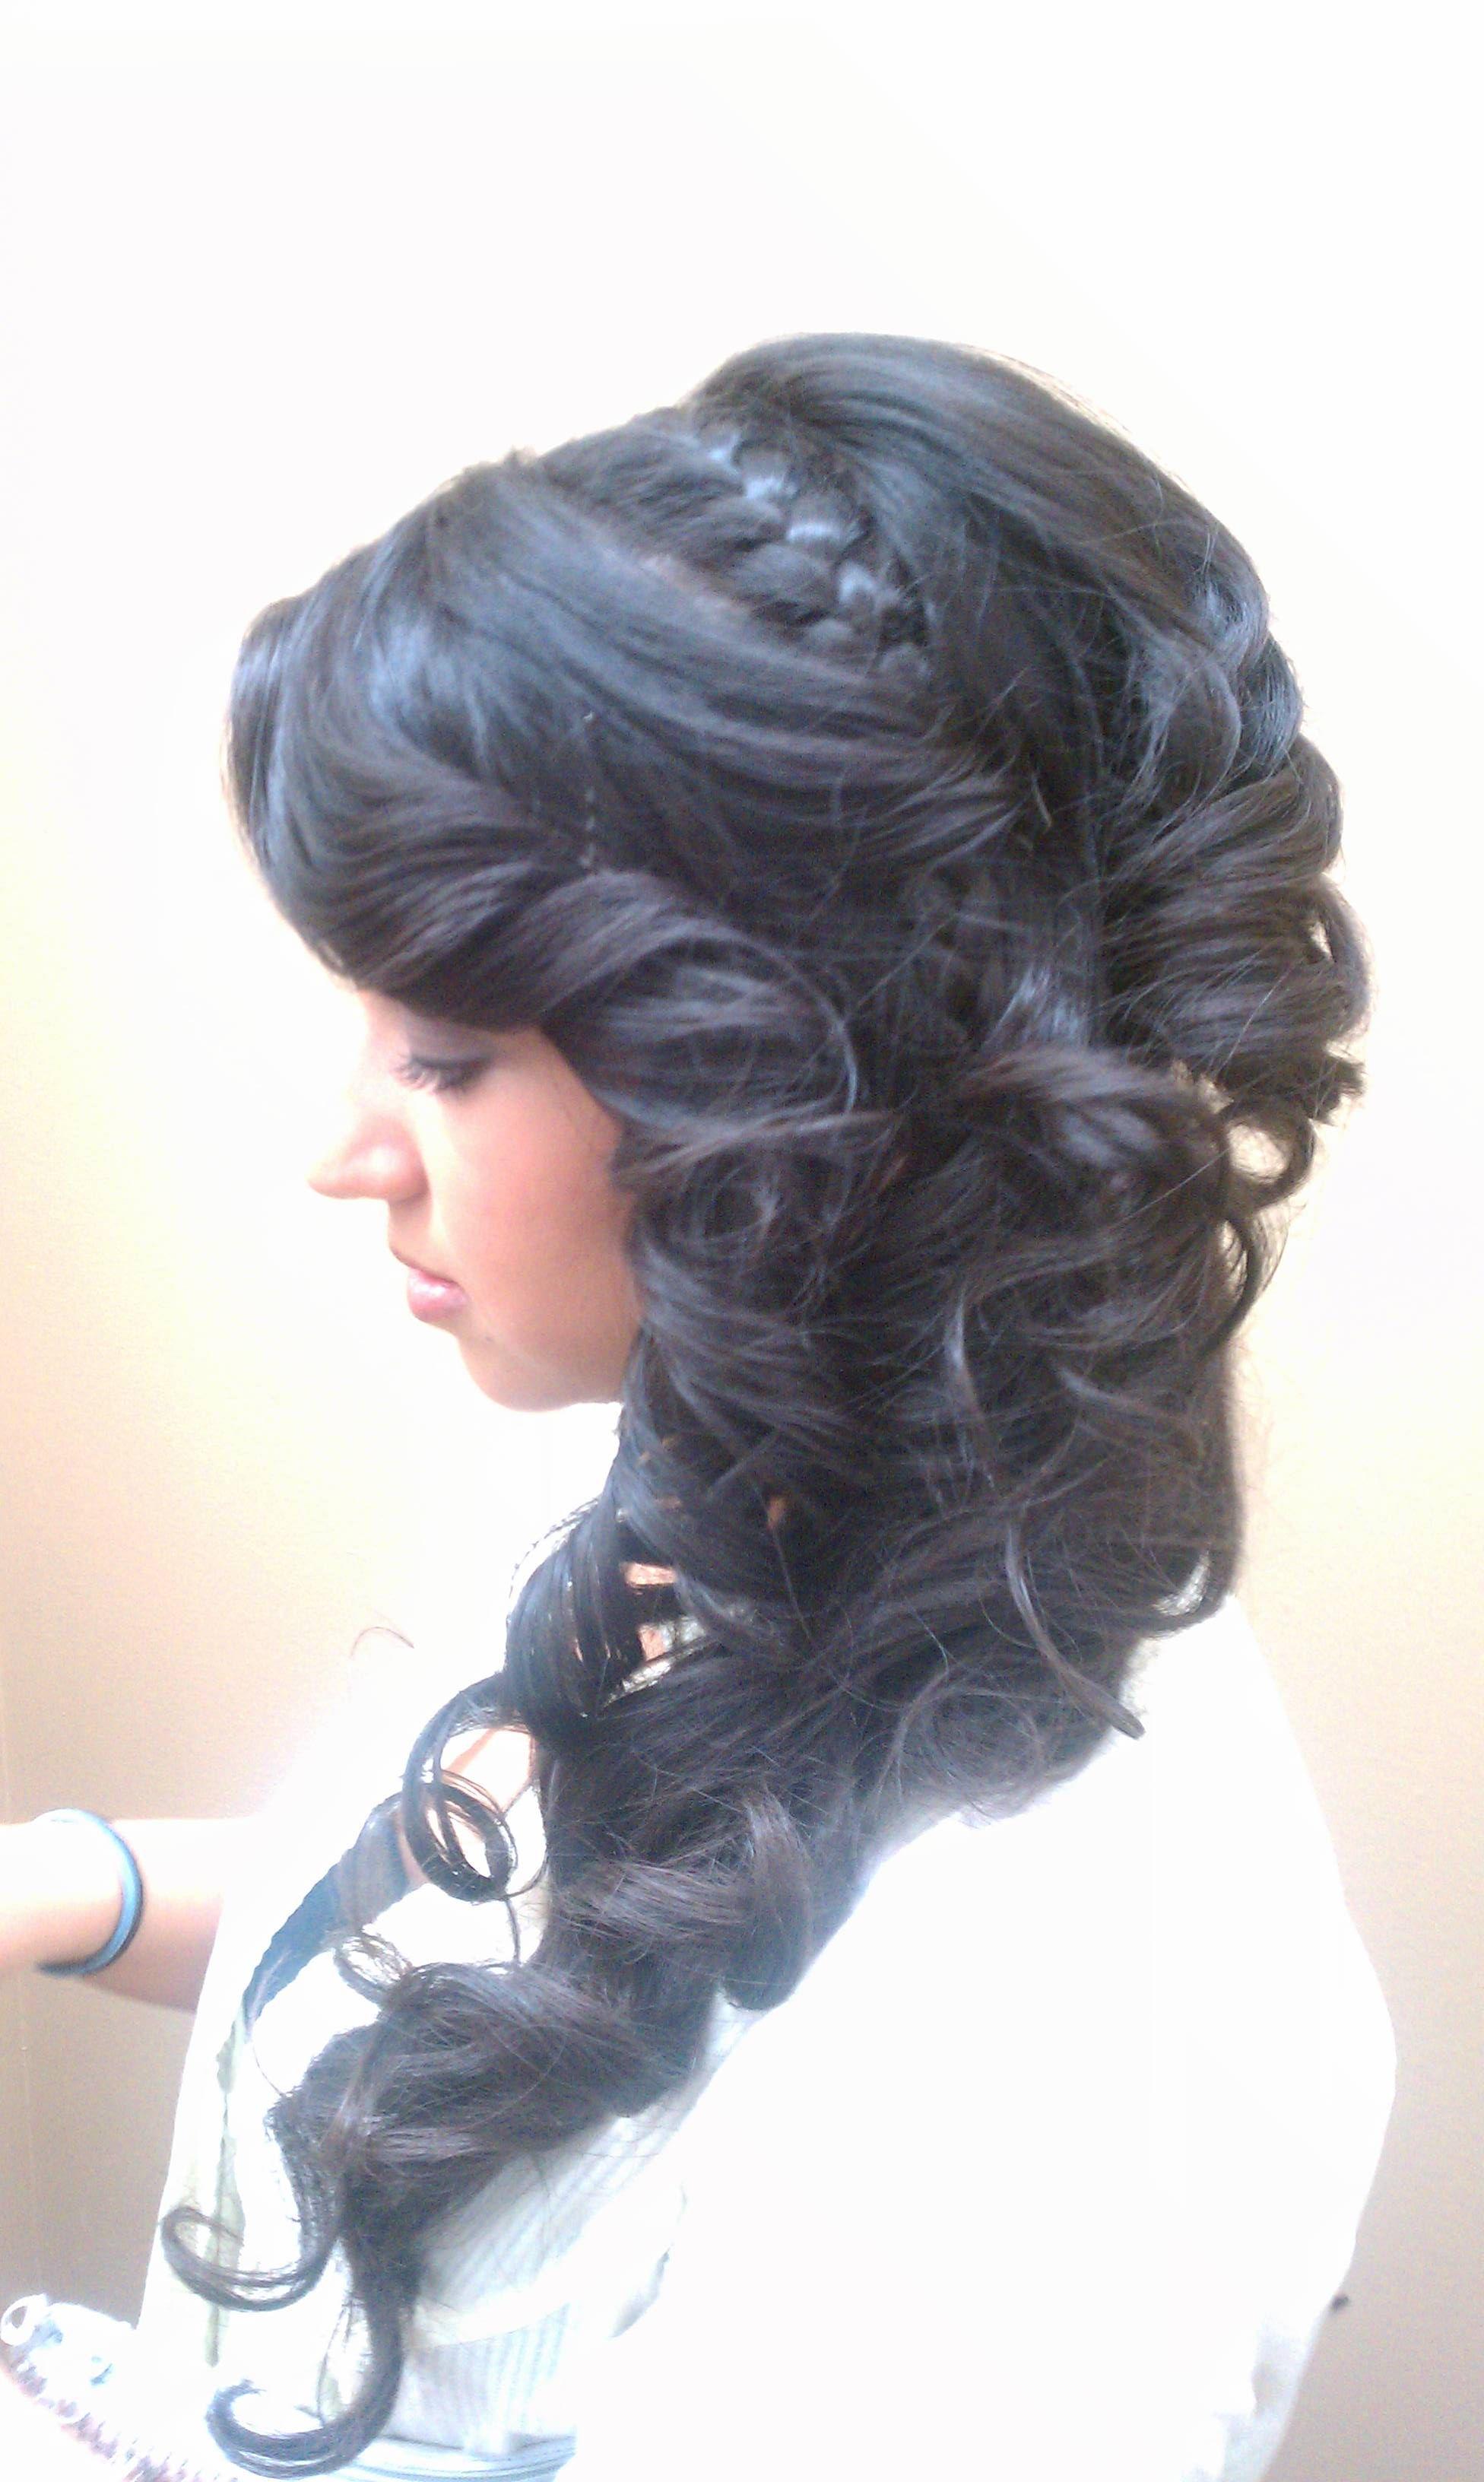 side, updo, long hair, braid, curls, tight curls, upstyle